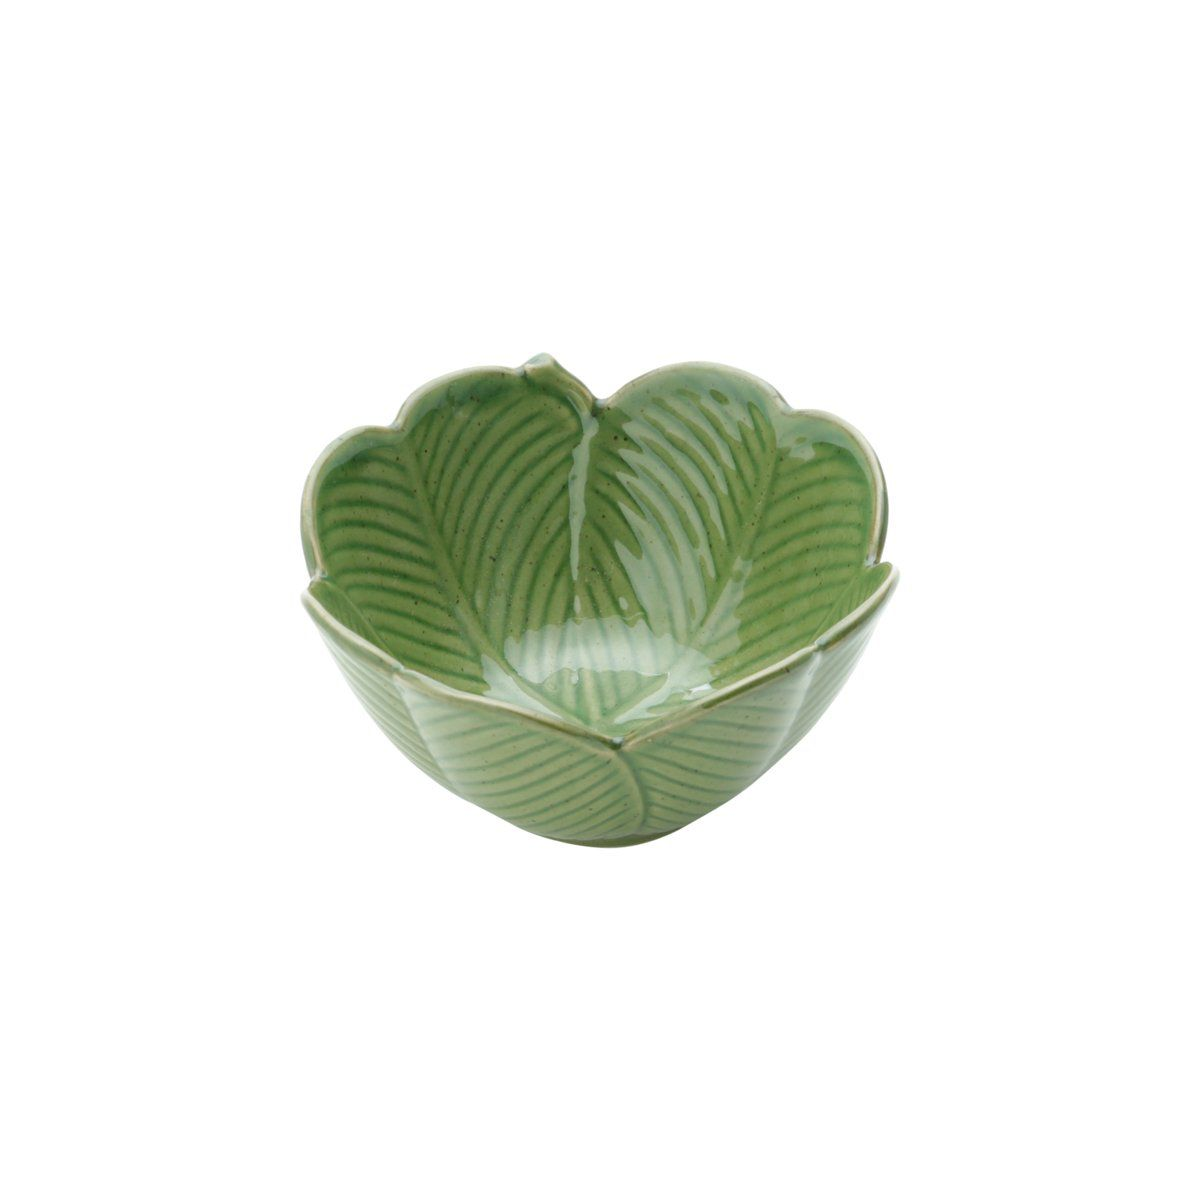 Centro de mesa decorativo 13 cm de cerâmica verde Banana Leaf Lyor - L4133